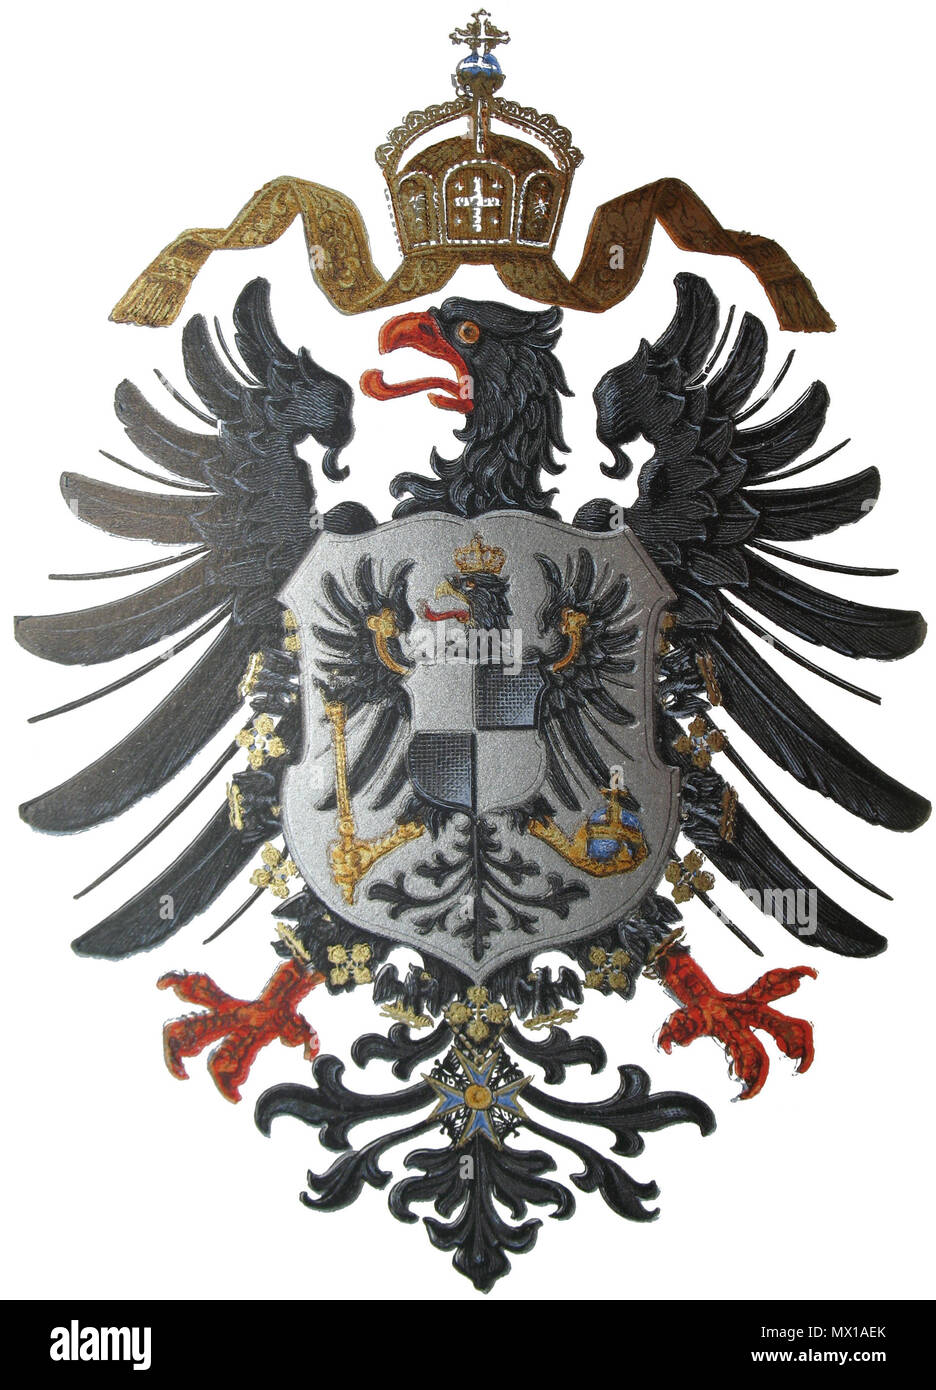 . Deutsch: Reichsadler des Preußisch-Deutschen Kaiserreiches ab 1874. English: Imperial Eagle of the German Empire to 1874. Italiano: Stemma dell'Impero Germanico (1874) . 1874. Unknown 295 Imperial Coat of arms of Germany (1874) Stock Photo